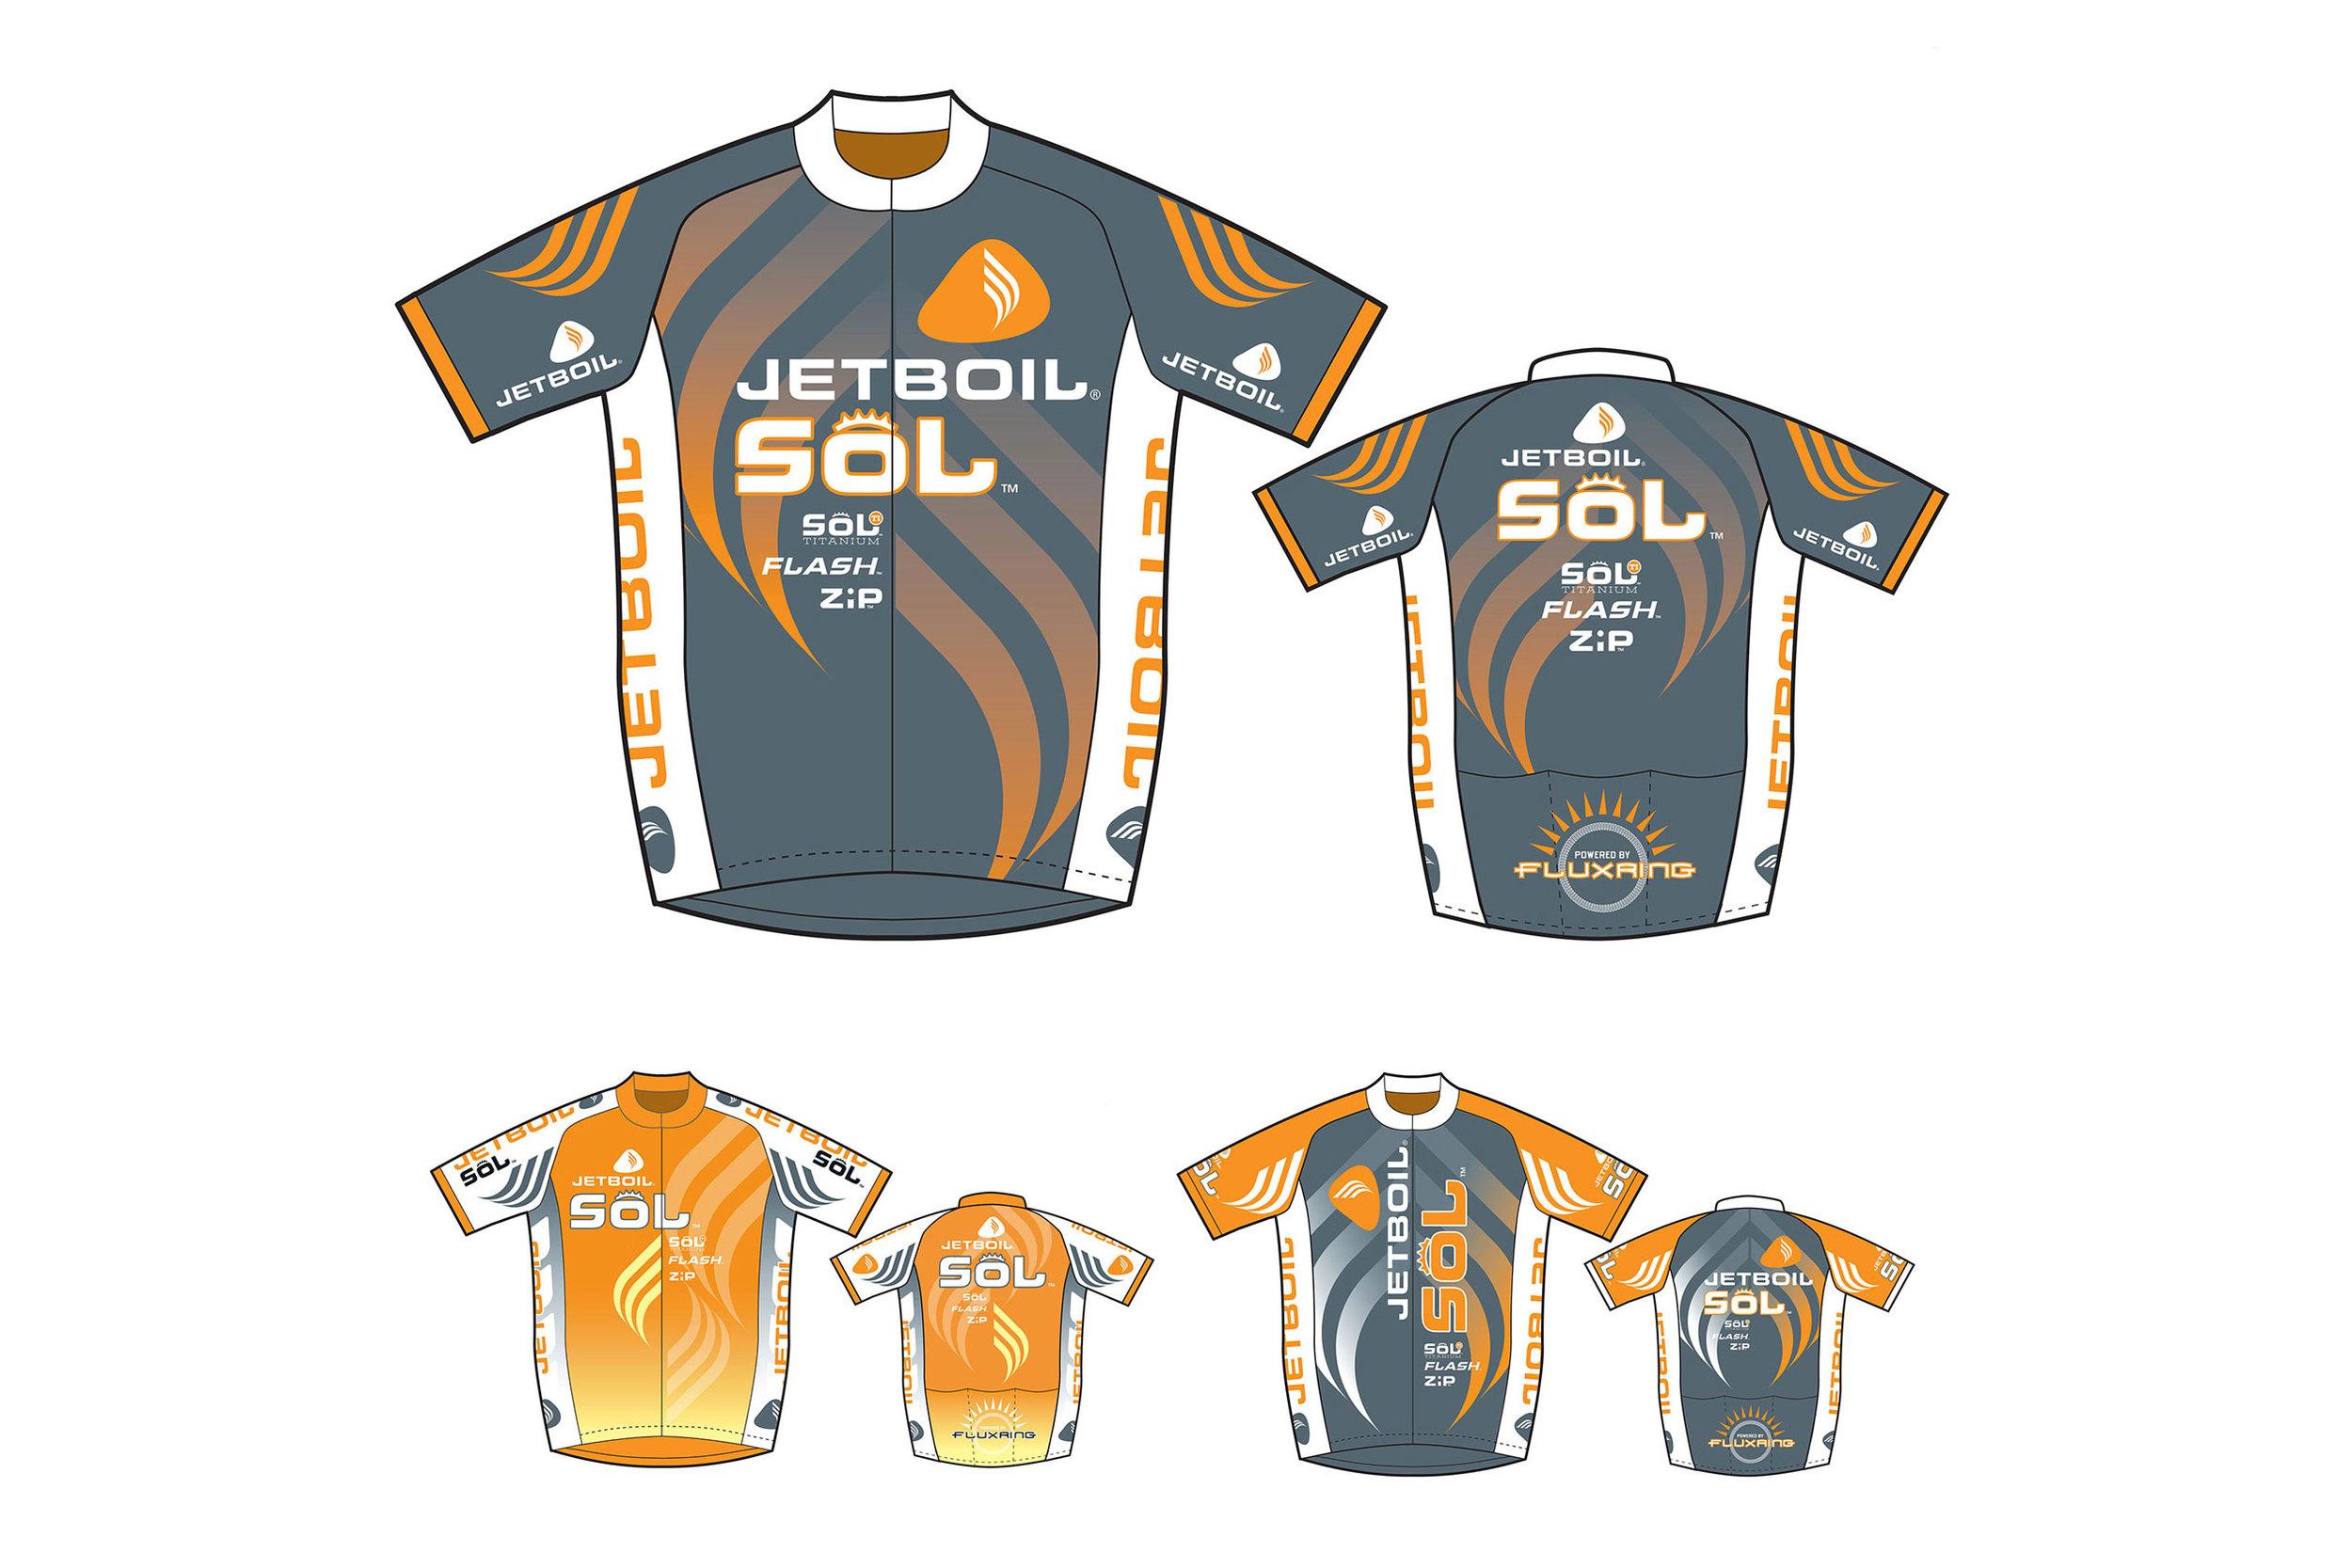 Jetboil Garment Design